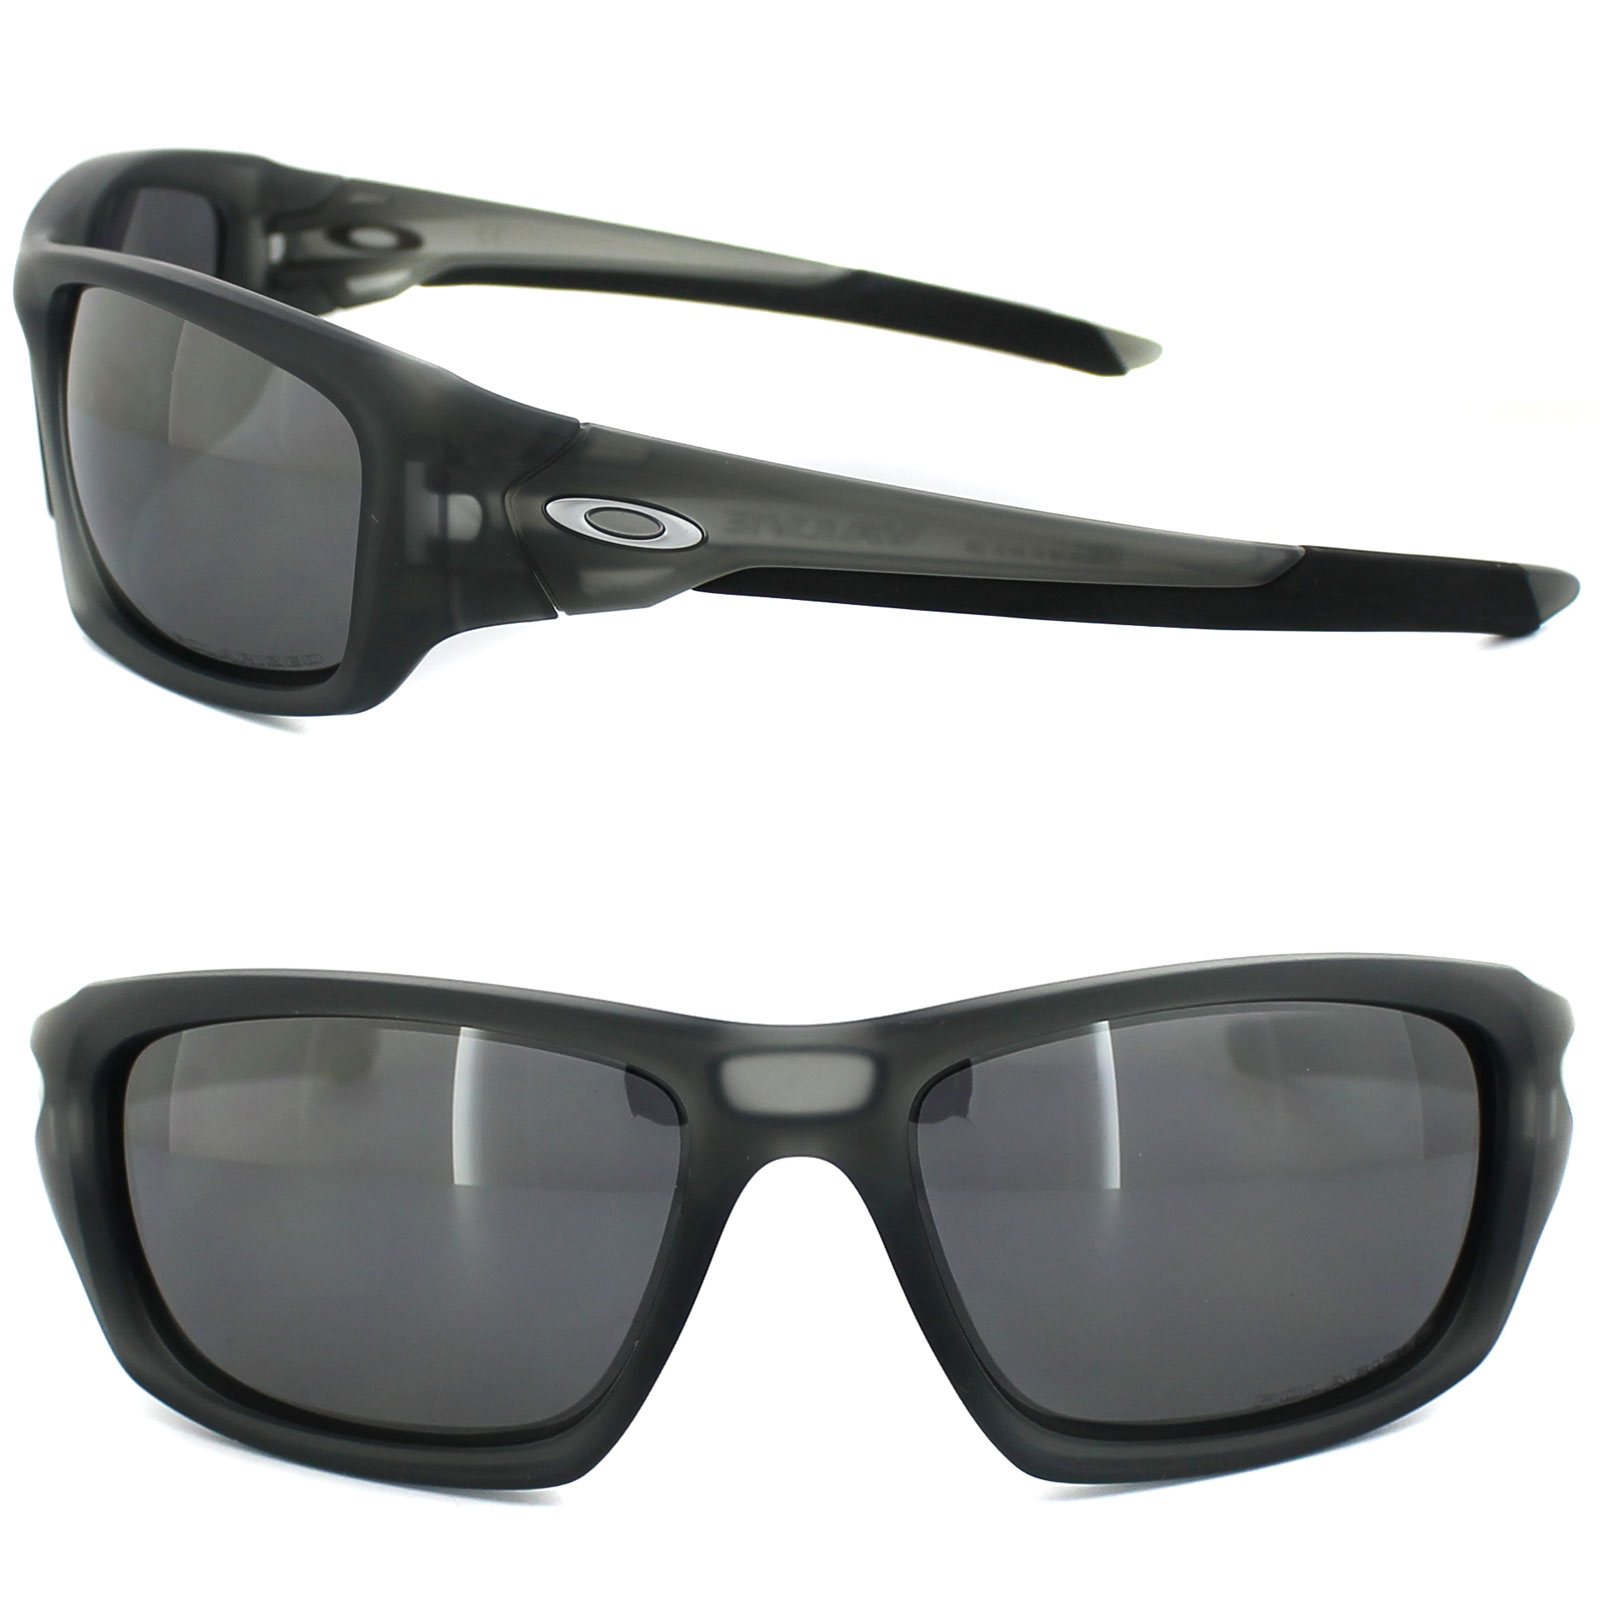 30c8c0118e Oakley Frogskin Sunglasses Ebay « Heritage Malta